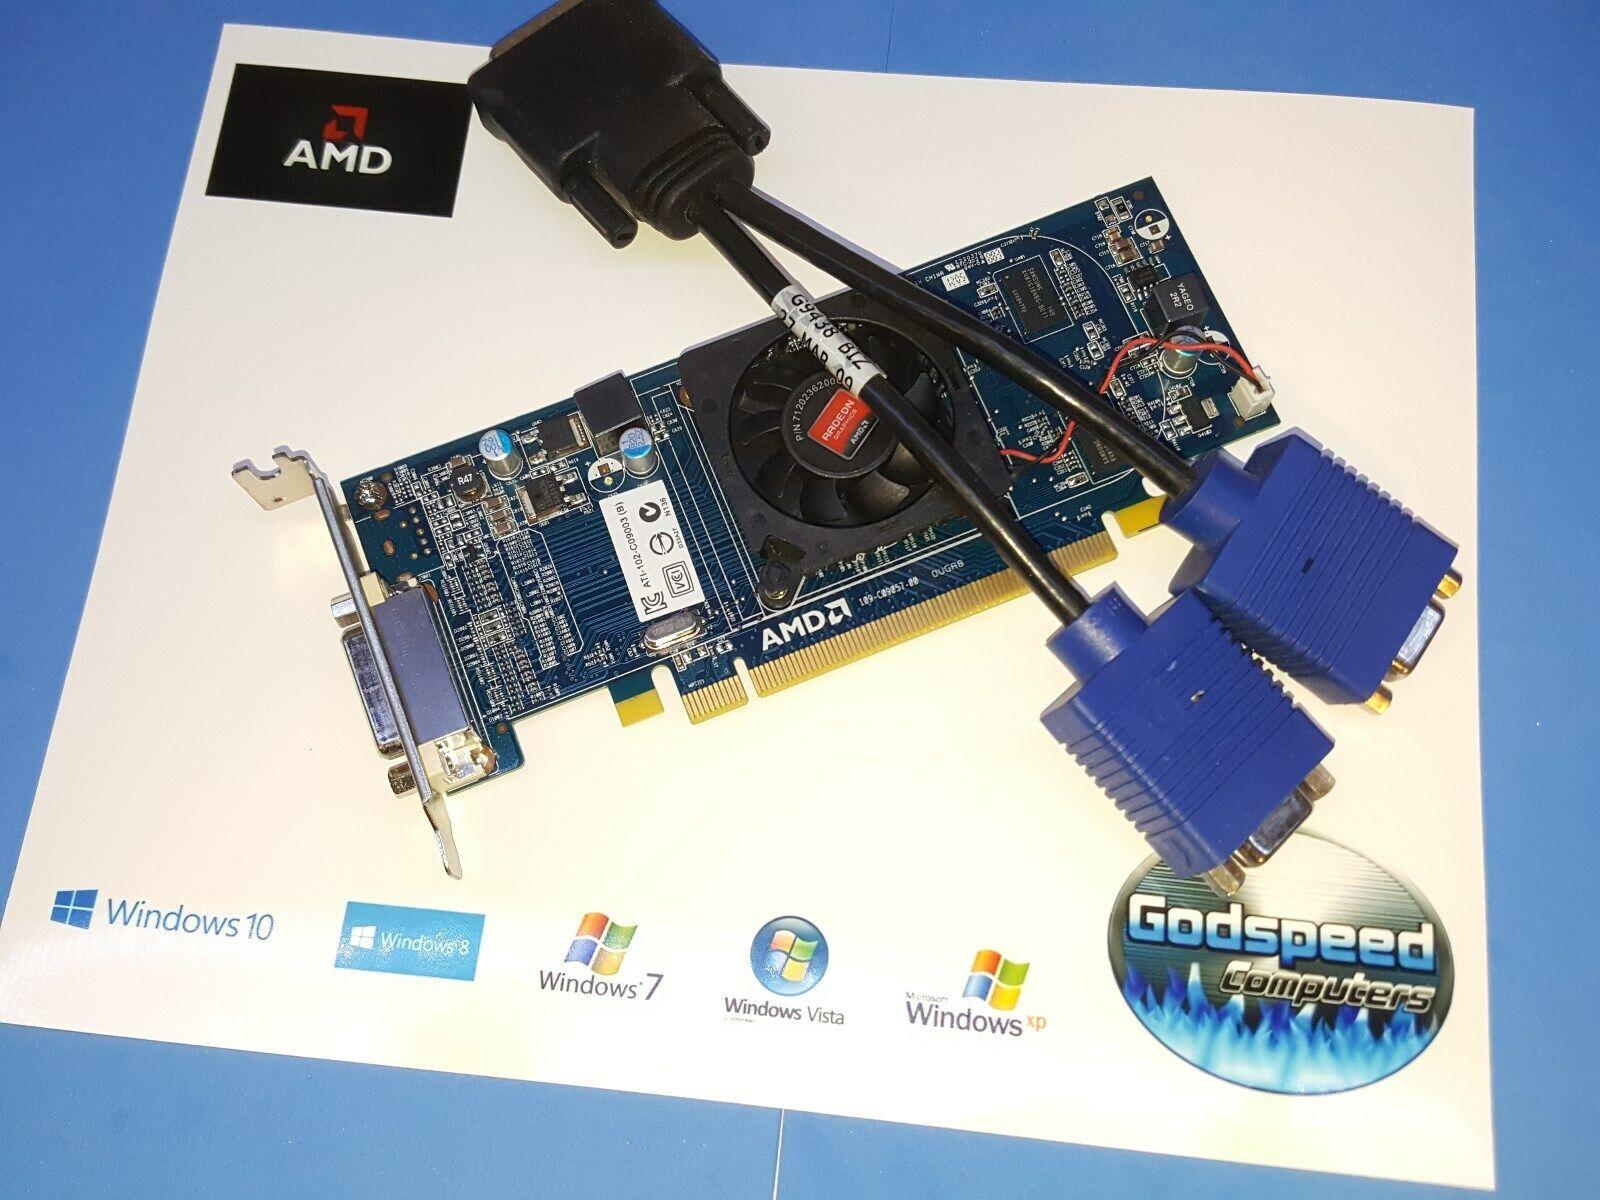 HP Pavilion s5503w s5510f s5510t s5510y Dual Display VGA Low Profile Video Card